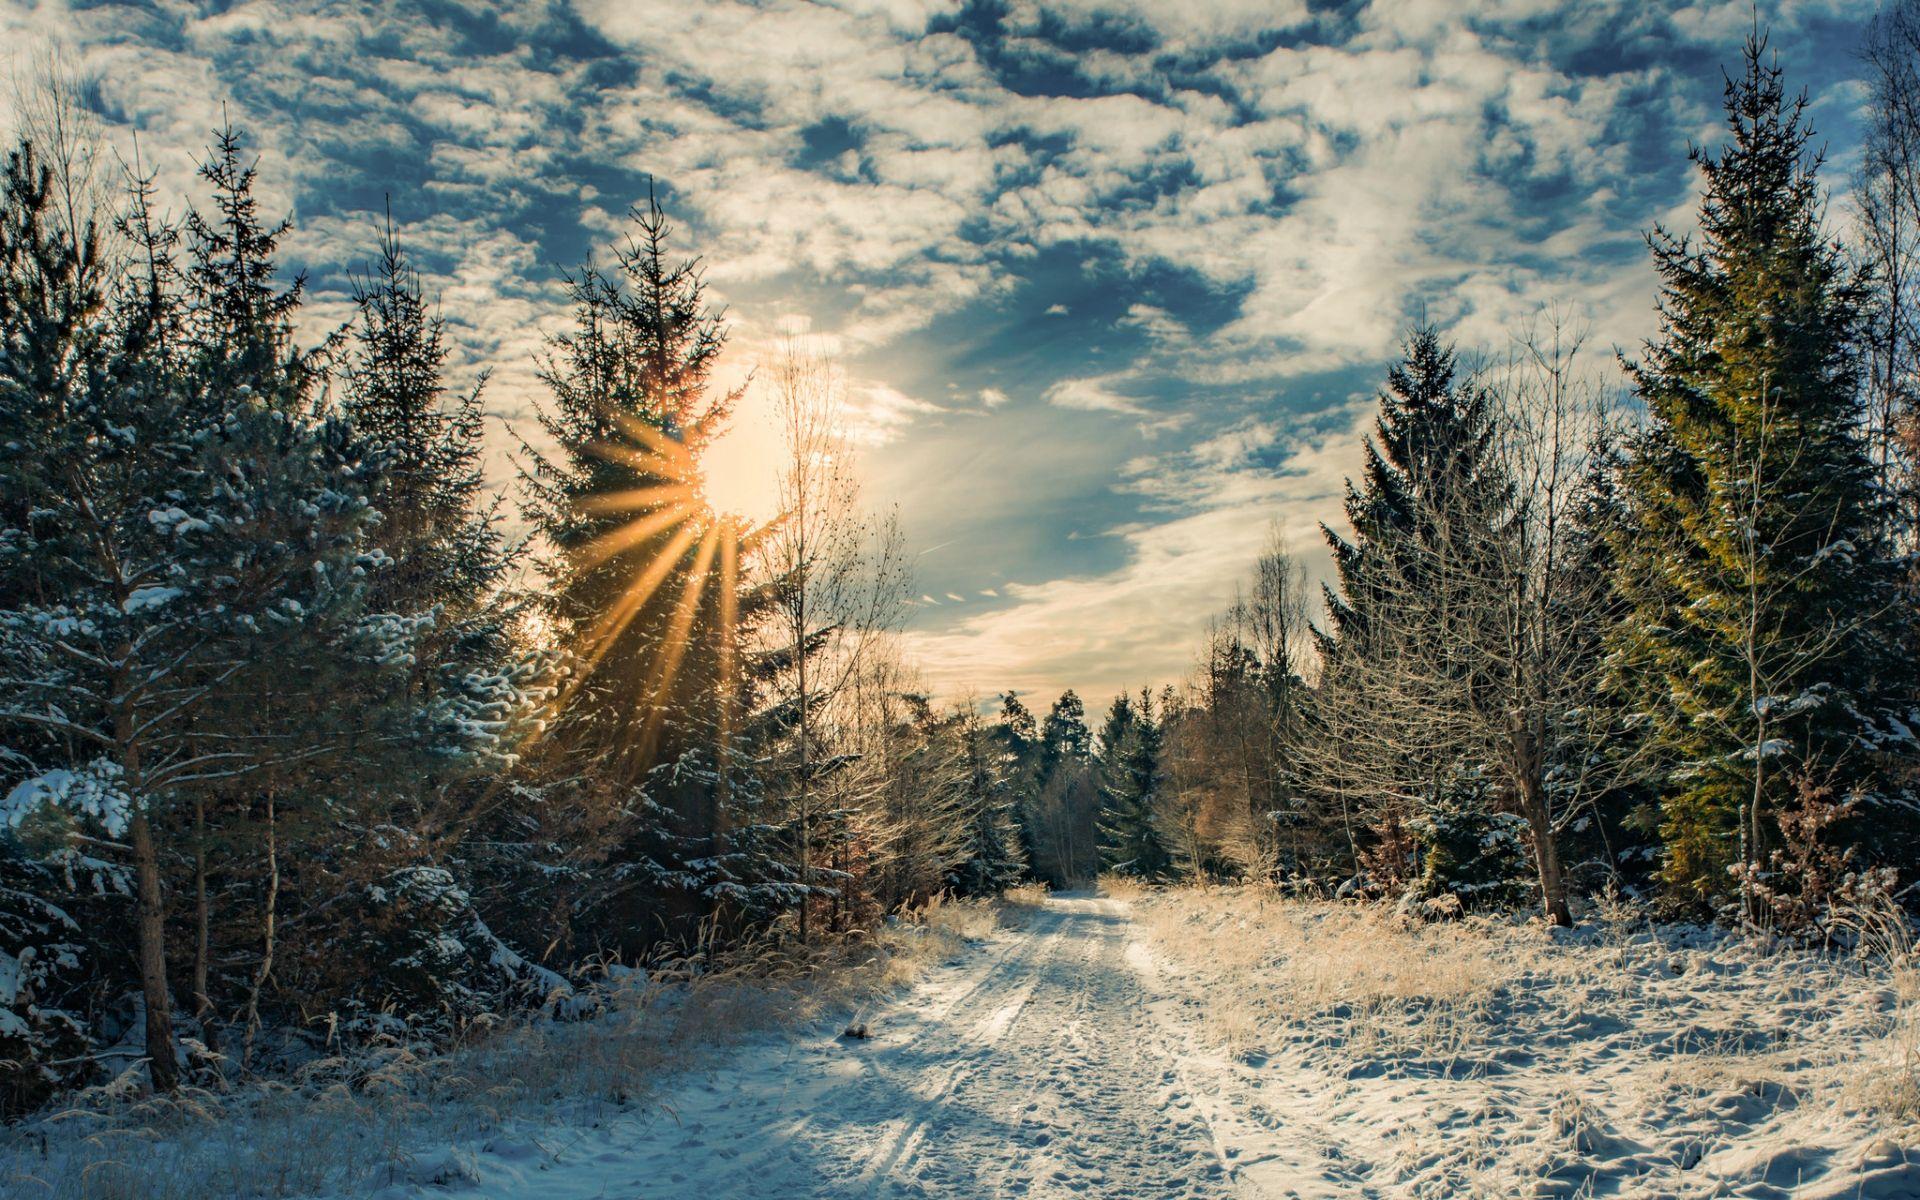 A Winter Season [19201200]